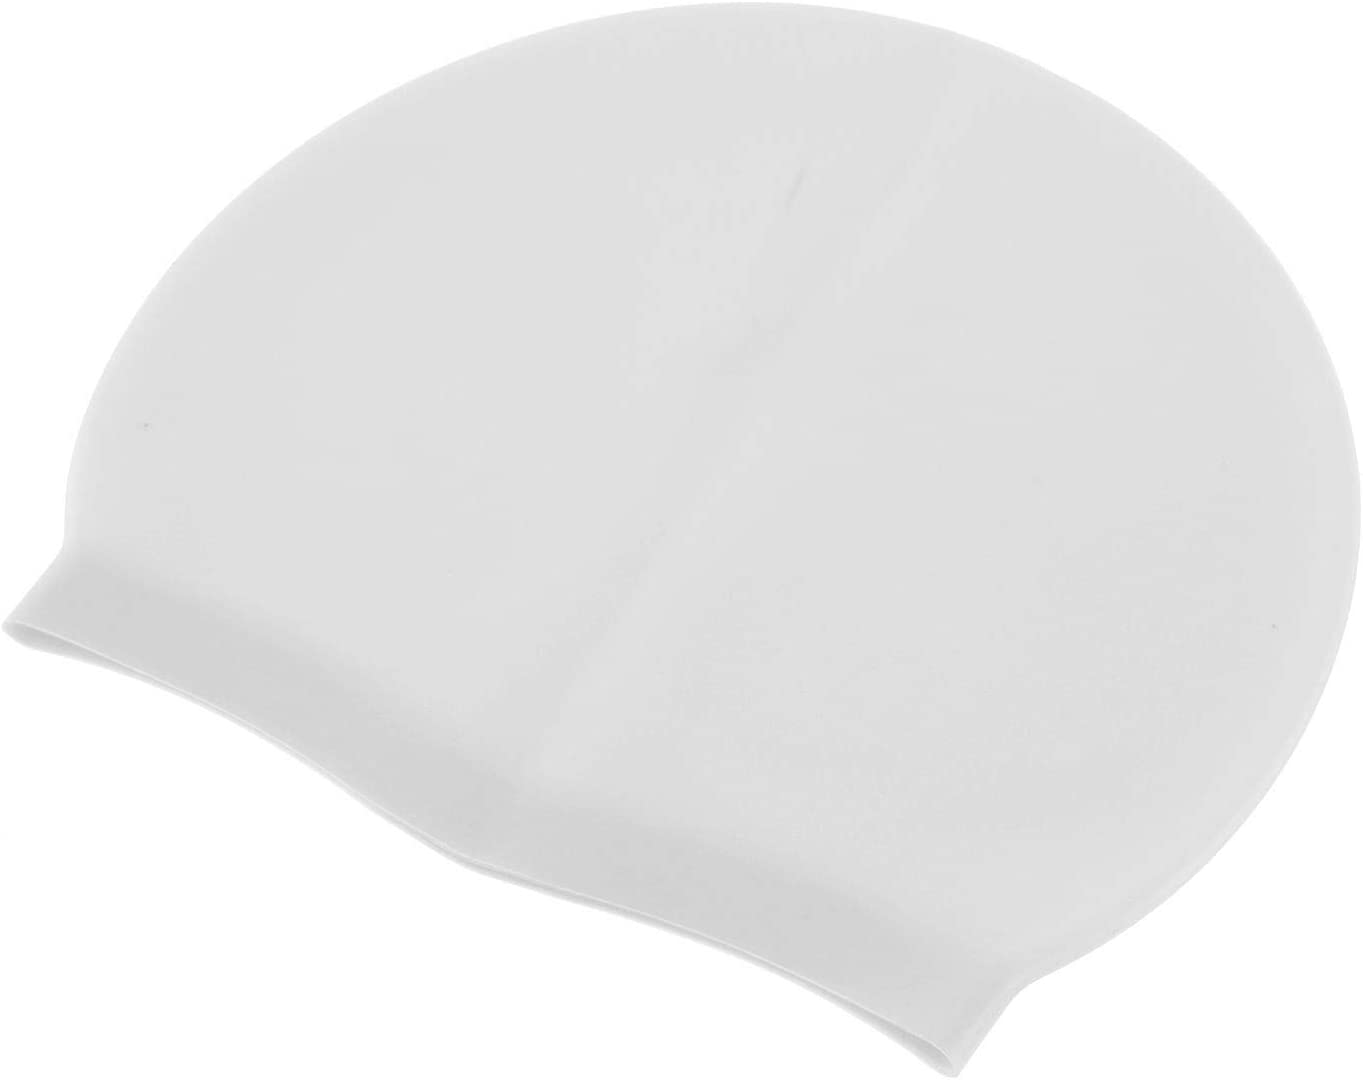 1 Pcs EliteKoopers Silicone Elastic Flexible Adult Swimming Hat For Swim Cap